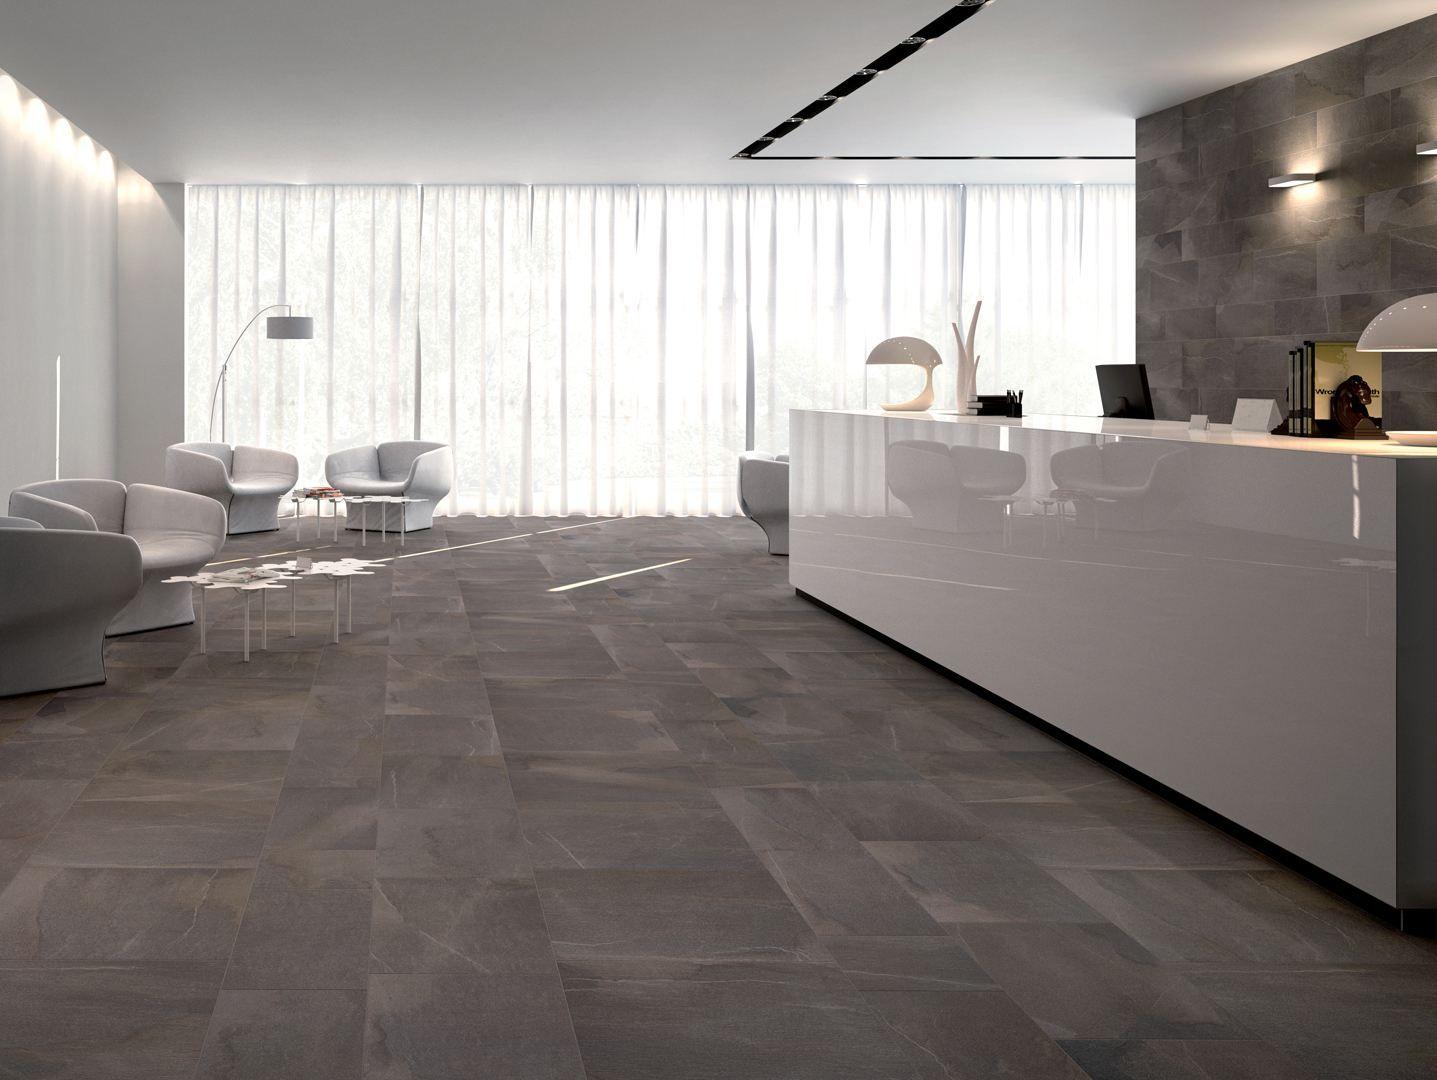 Indooroutdoor wallfloor tiles percorsi extra pietra di barge by indooroutdoor wallfloor tiles percorsi extra pietra di barge by ceramiche keope dailygadgetfo Choice Image